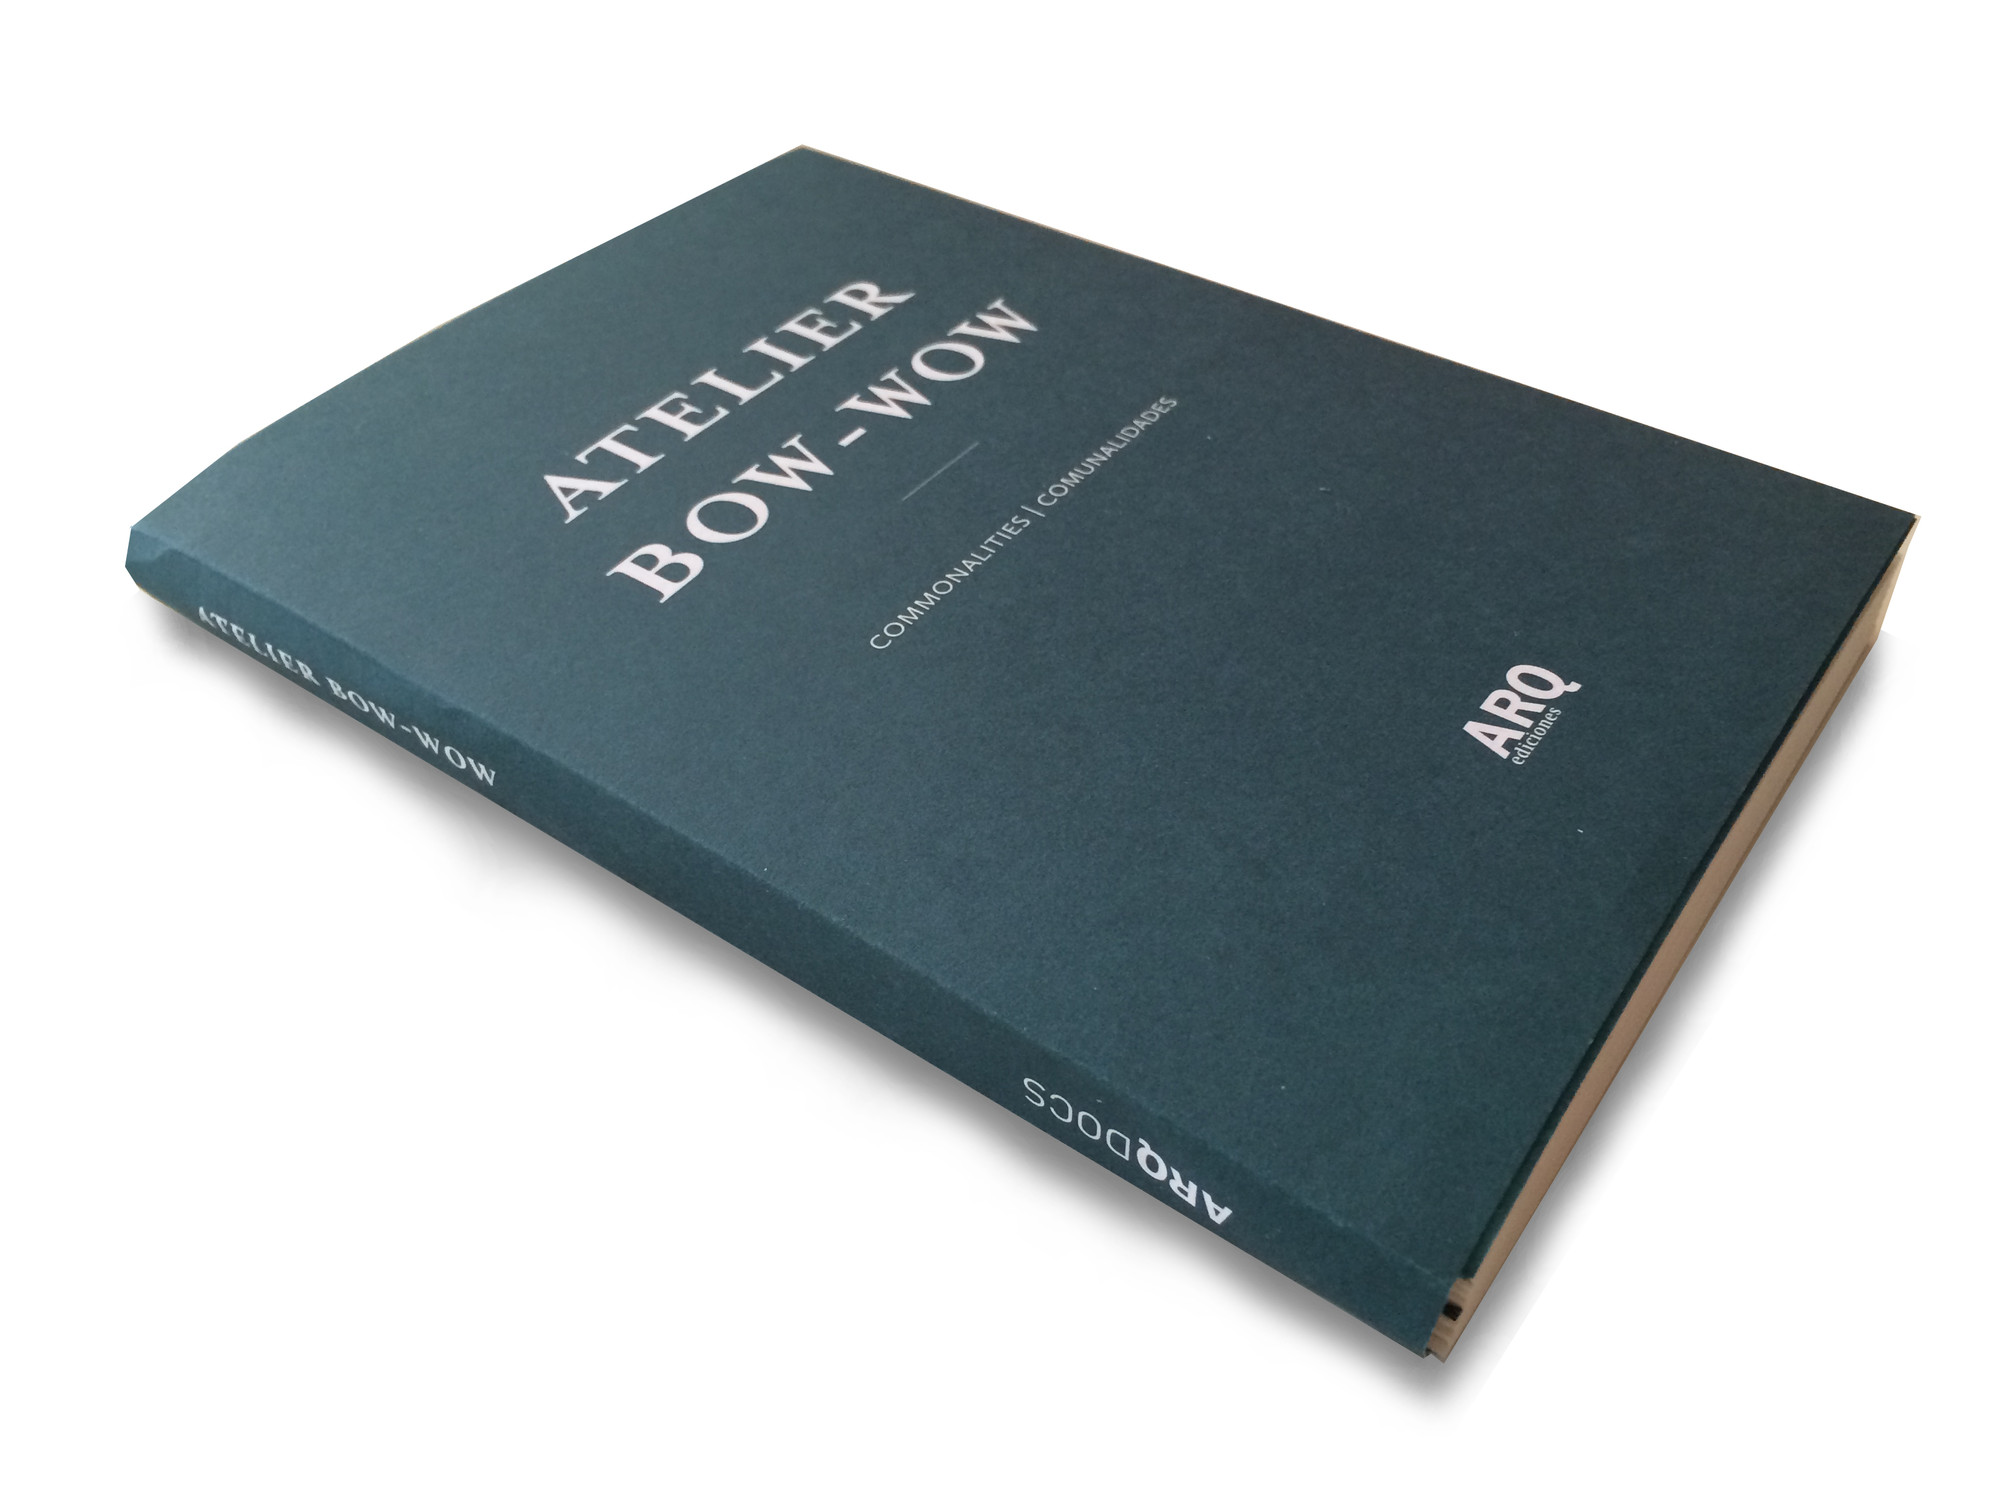 Atelier Bow-Wow / Ediciones ARQ